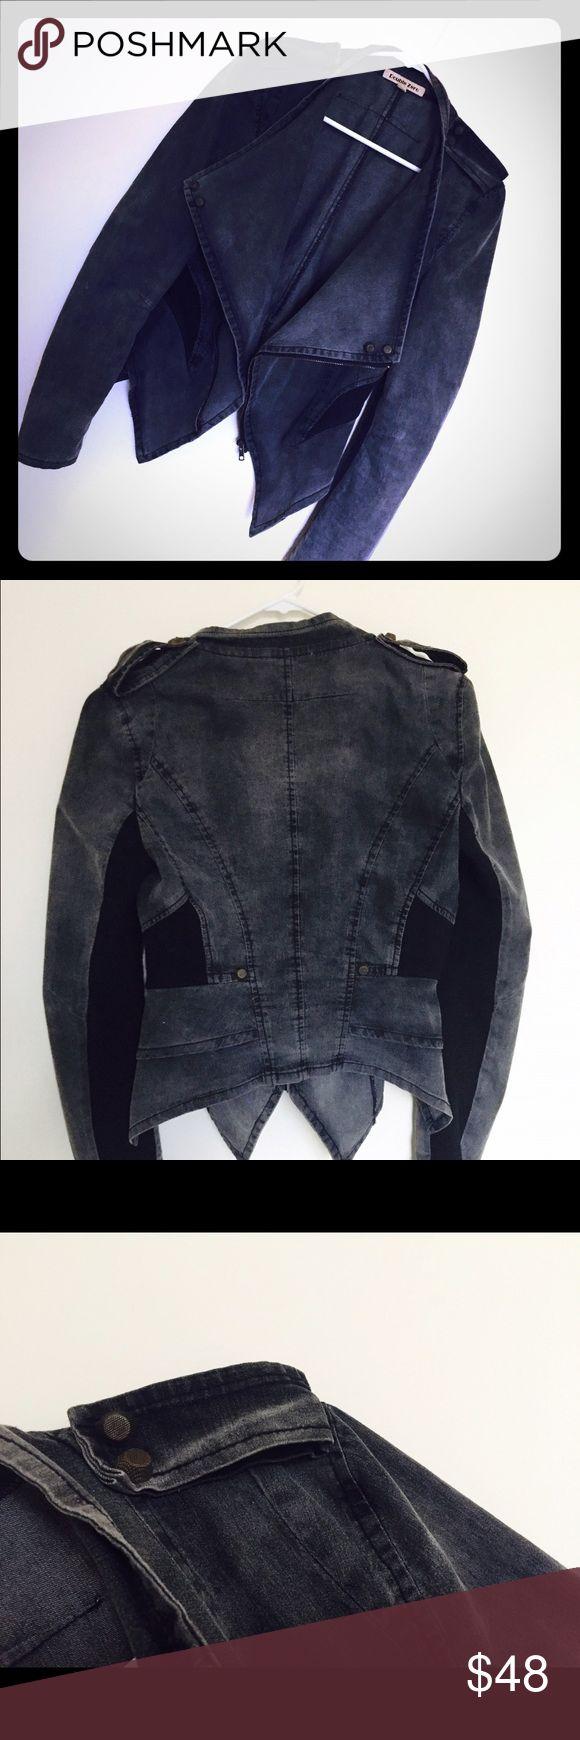 Dark grey jacket Very comfortable denim jacket with zipper. It has size L on tag but runs small Double Zero Jackets & Coats Jean Jackets